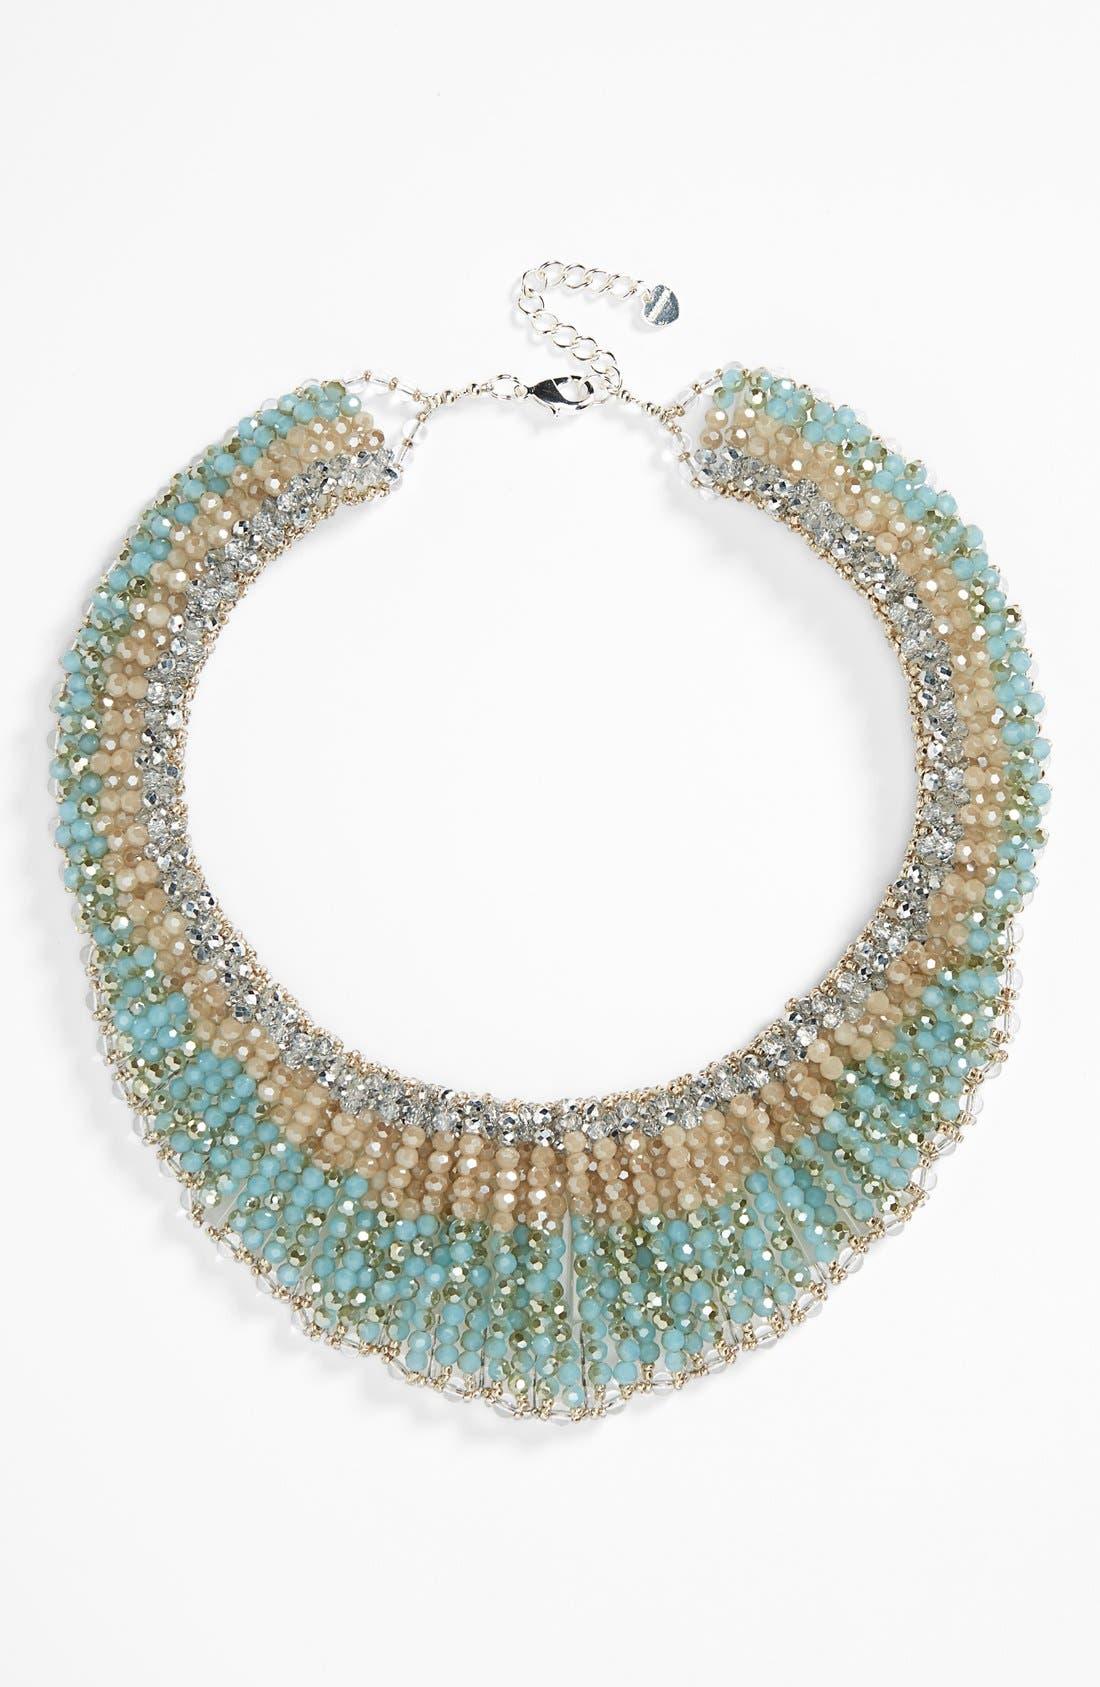 Main Image - Nakamol Design Crystal Collar Necklace